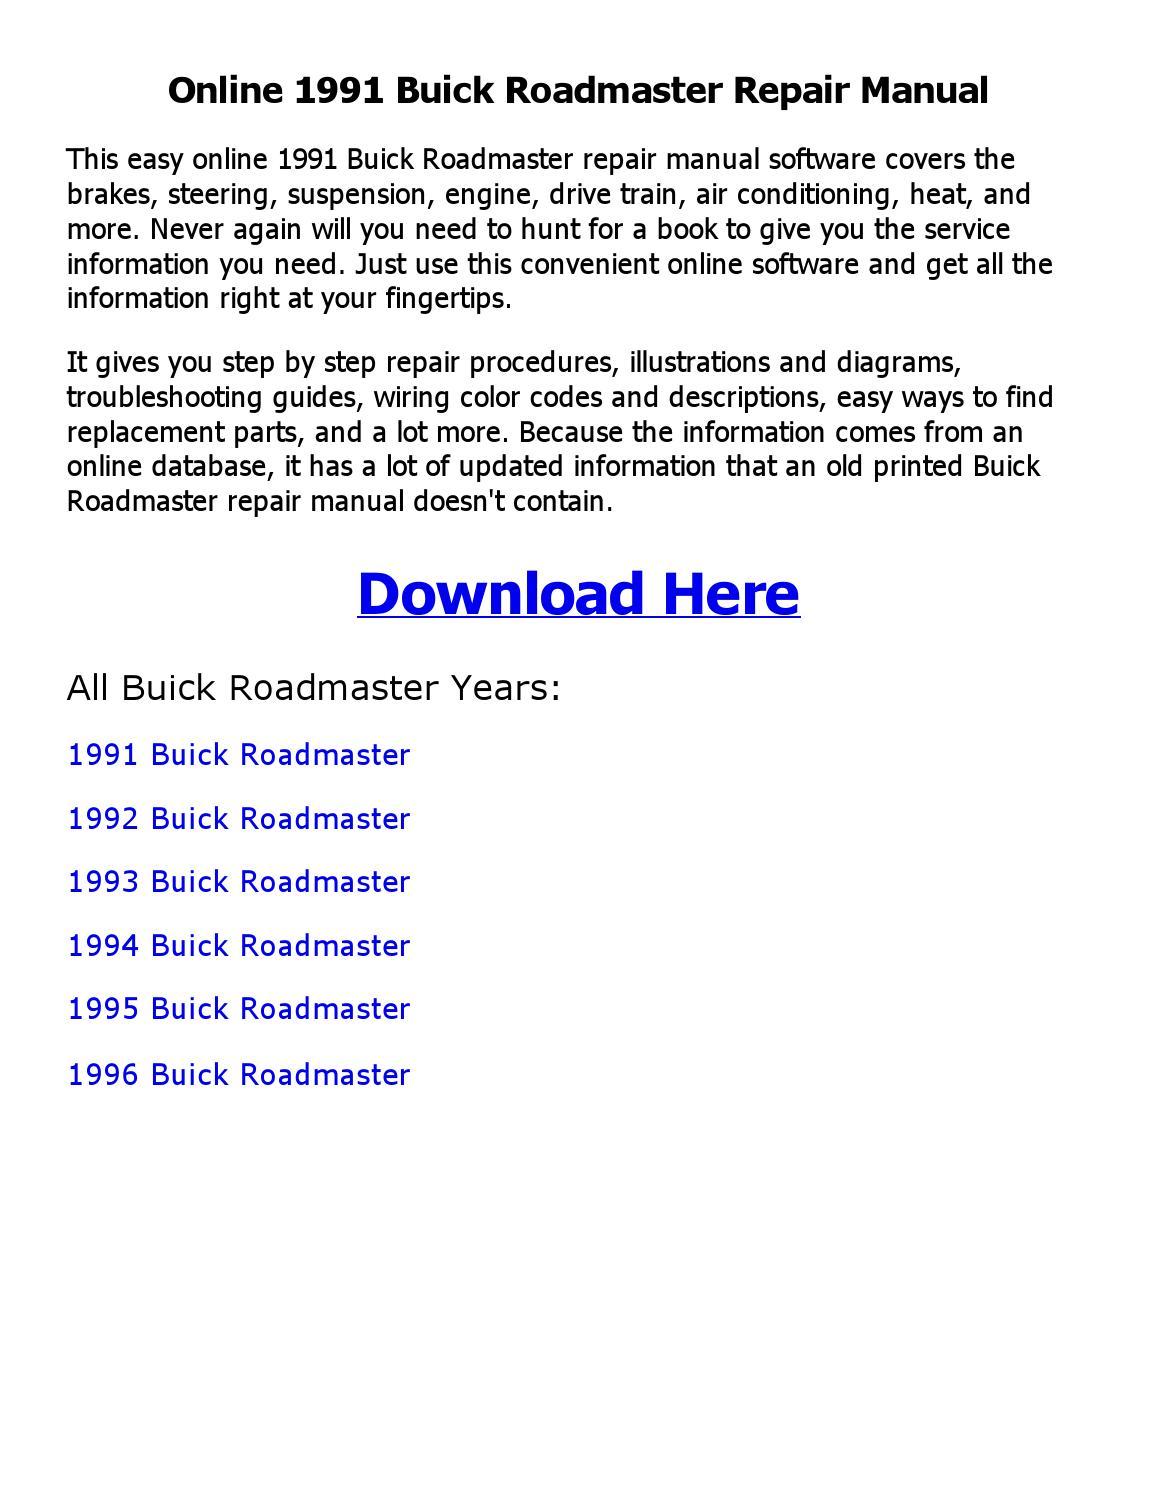 1991 Buick Roadmaster Repair Manual Online By Ehs 1993